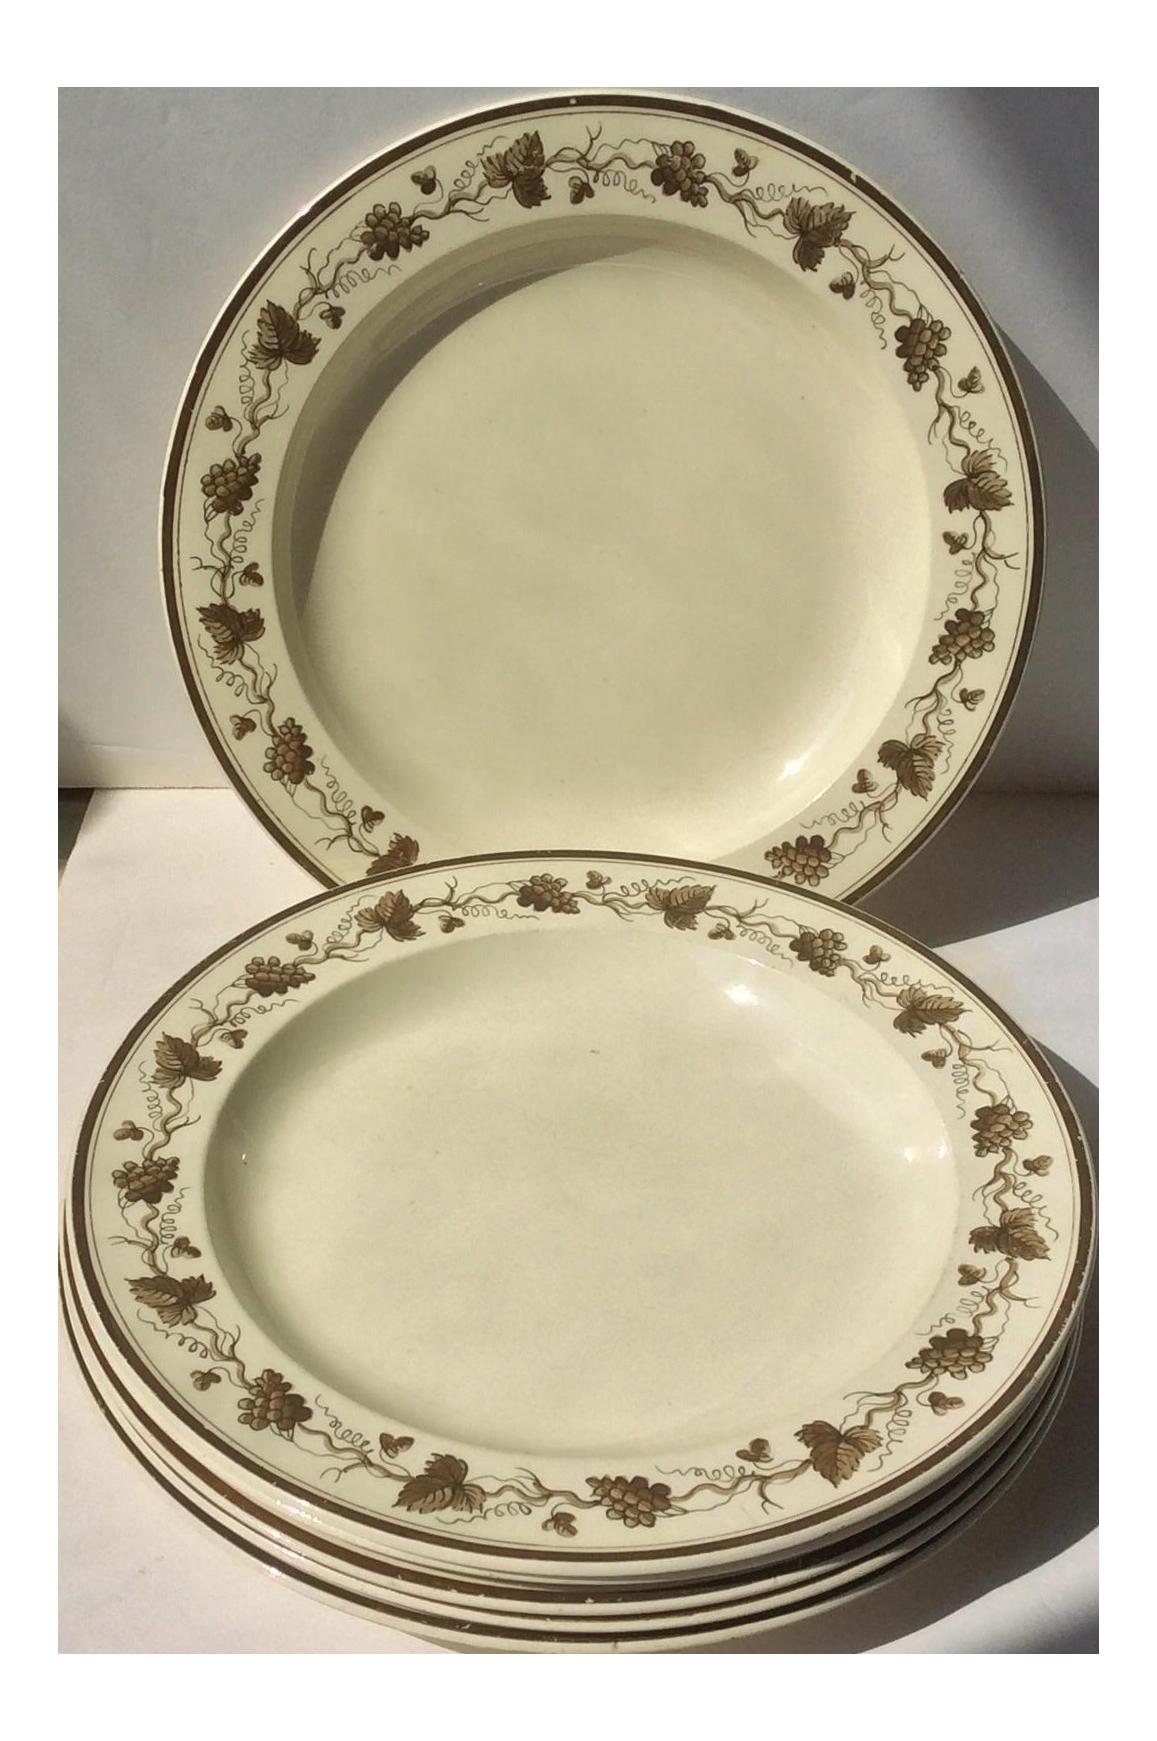 Creamware Plates With Grape Leaf Design - Set of 6  sc 1 st  Chairish & Creamware Plates With Grape Leaf Design - Set of 6 | Chairish